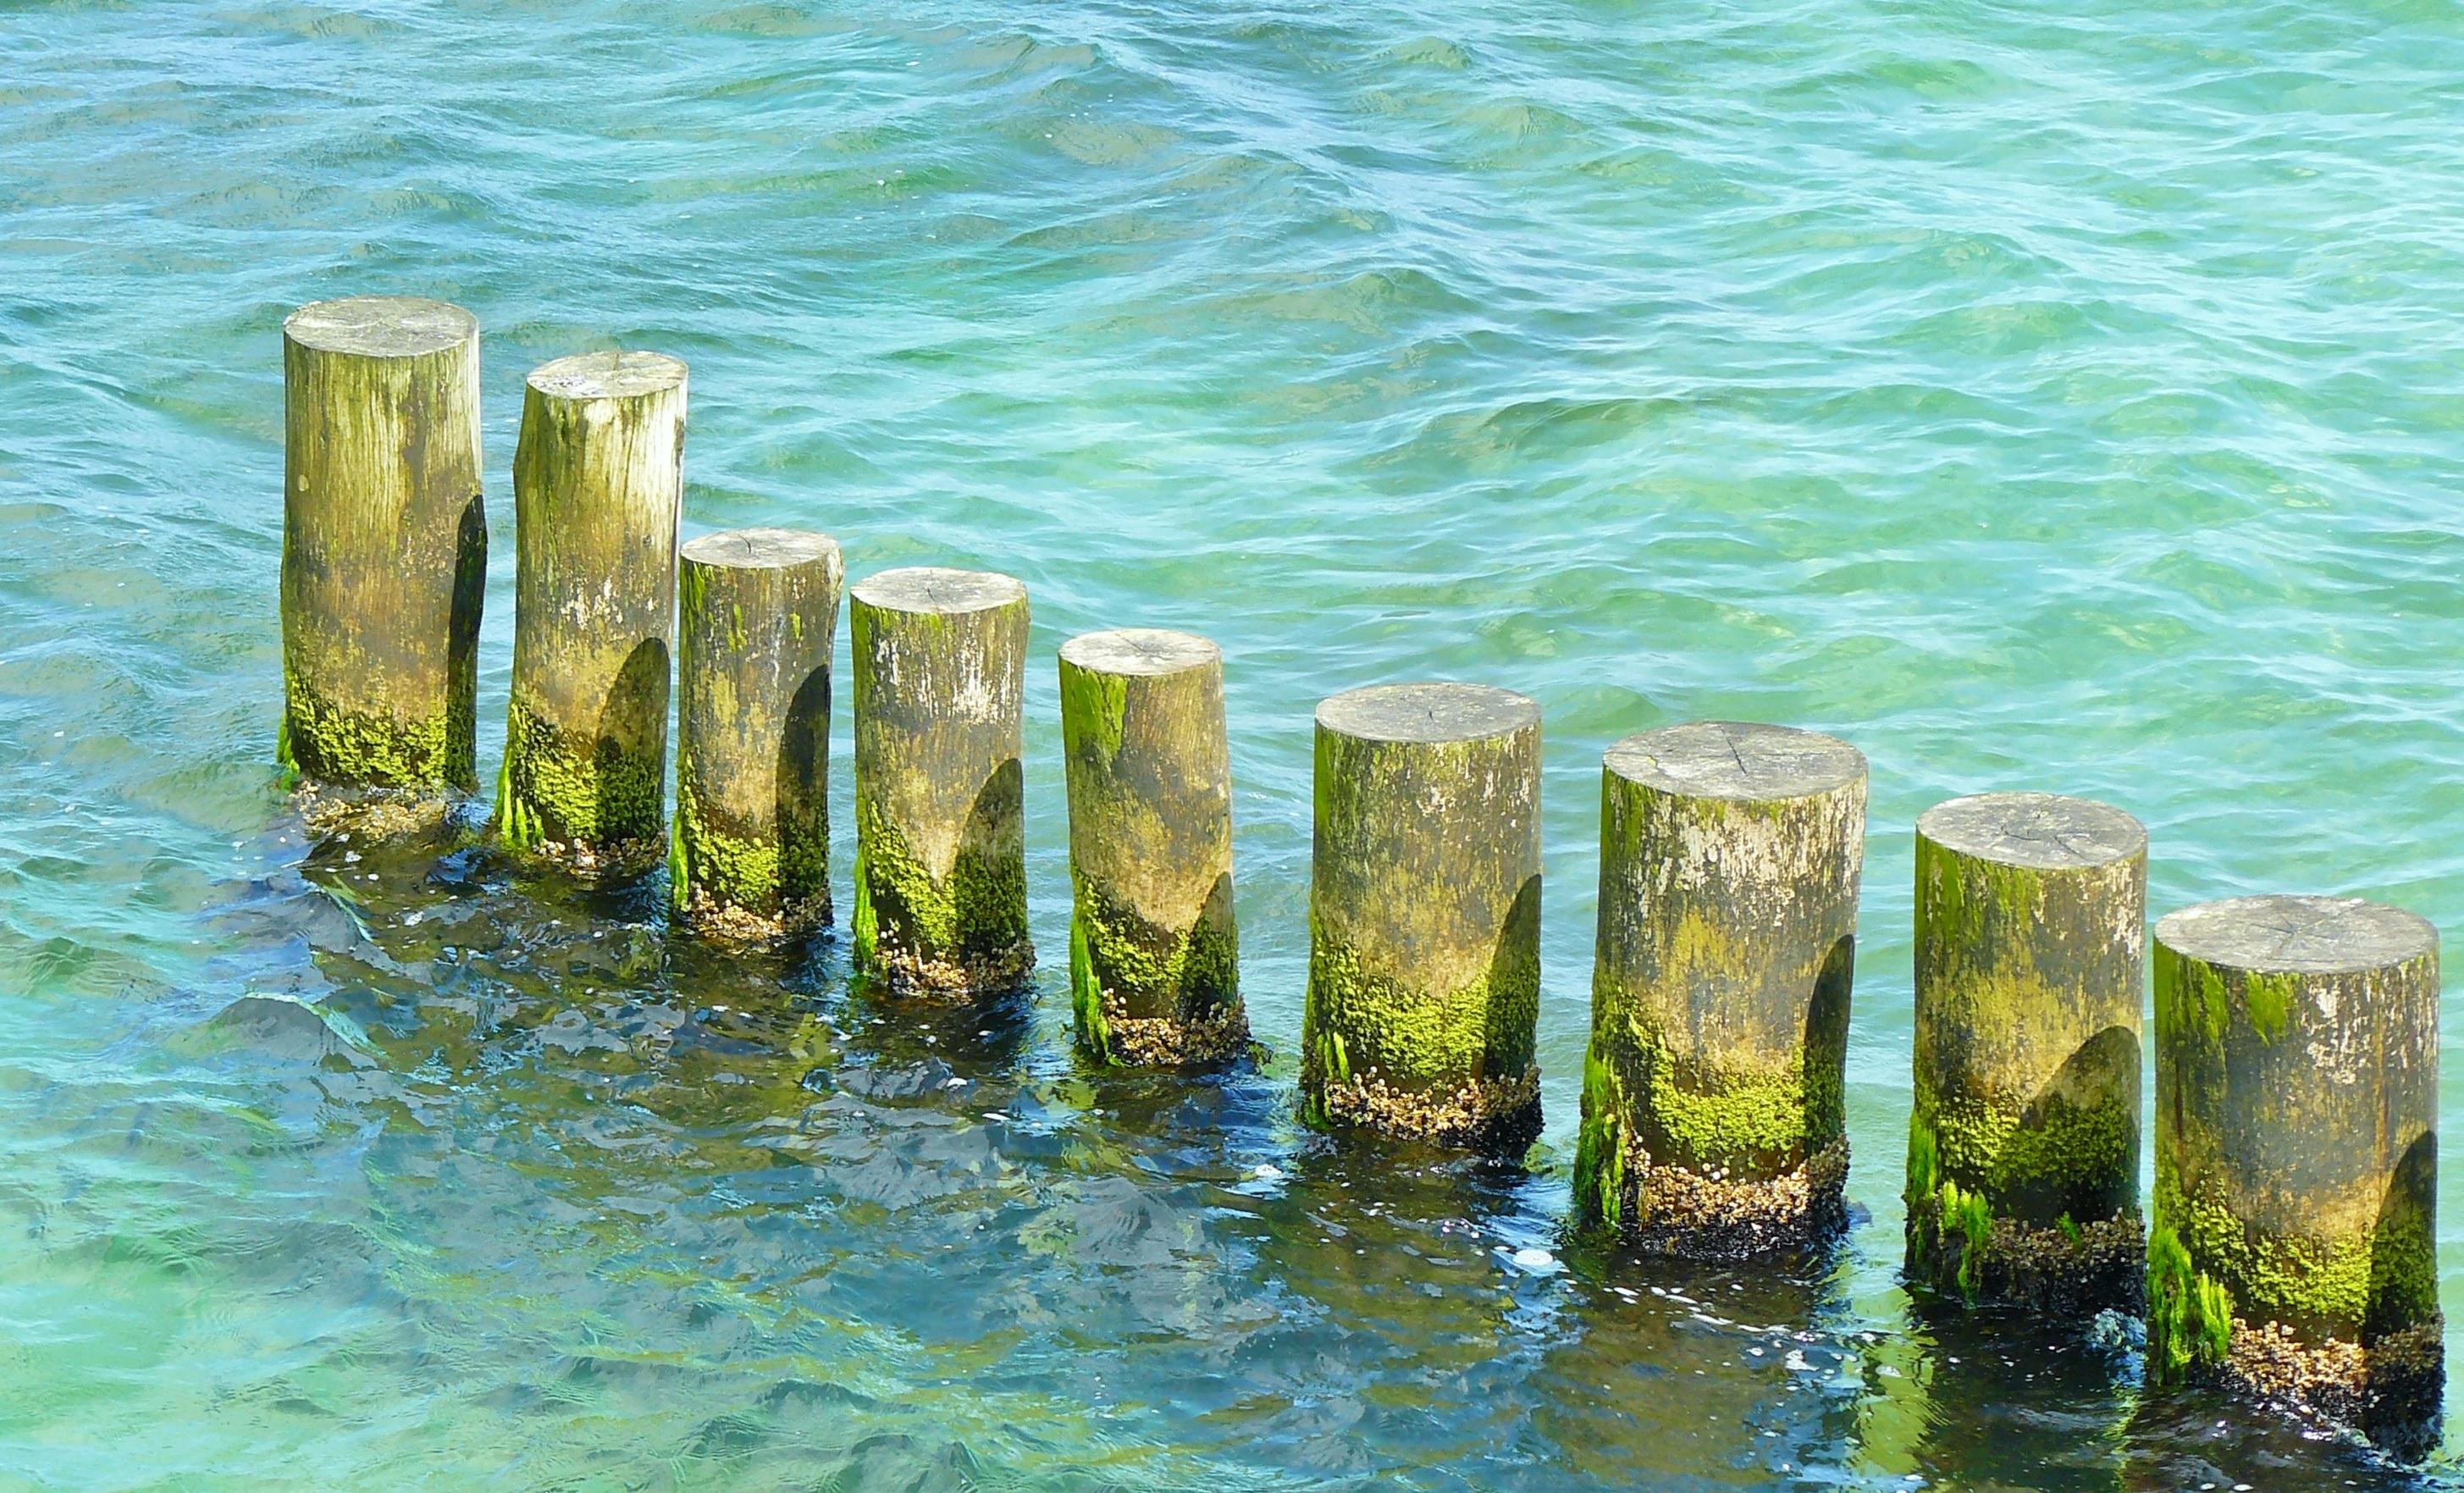 Fotos gratis : playa, costa, Oceano, ligero, apuntalar, ola, verde ...